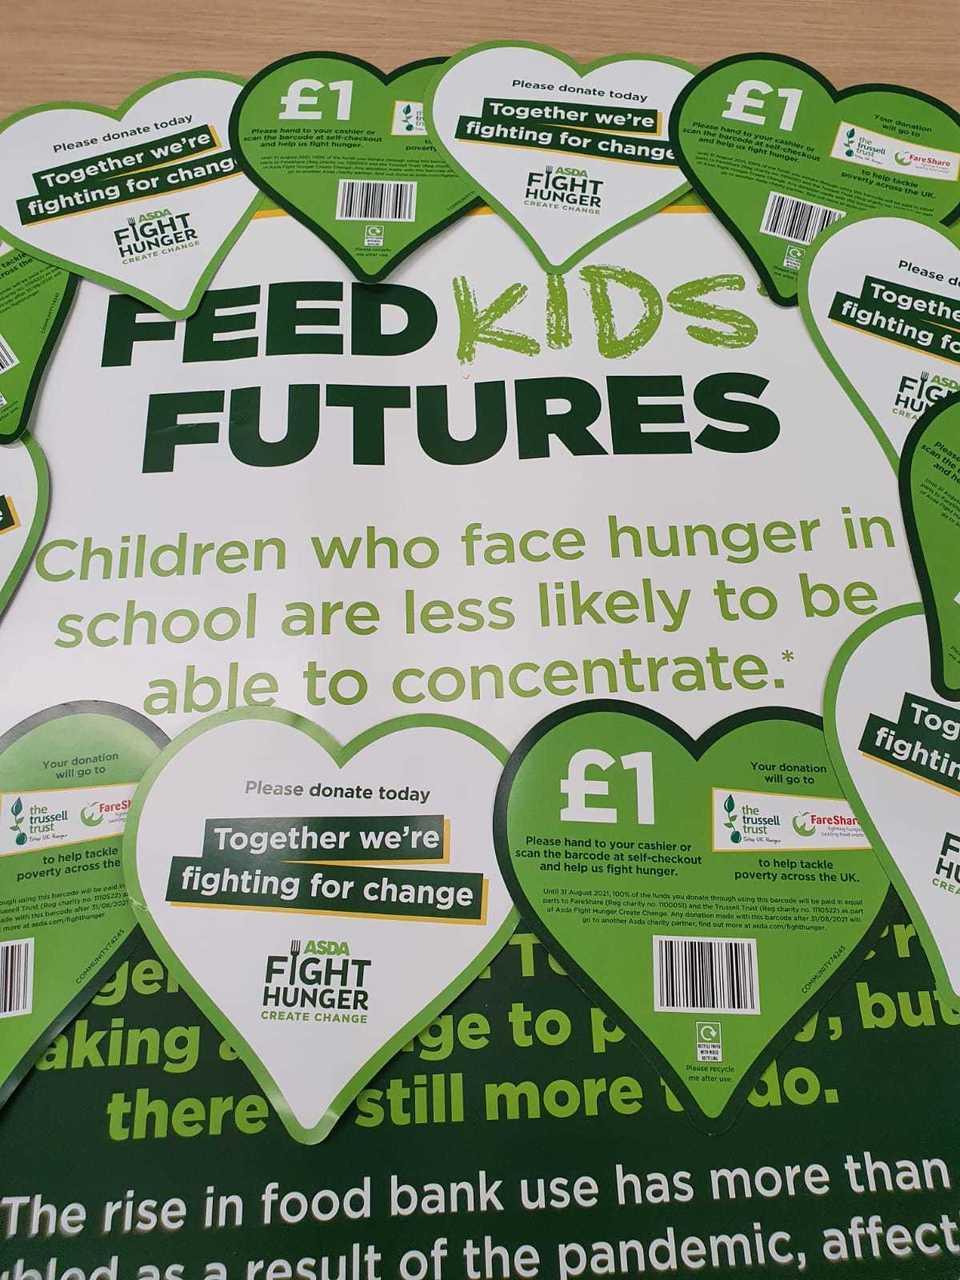 Fight Hunger Create Change | Asda Sheffield Drakehouse